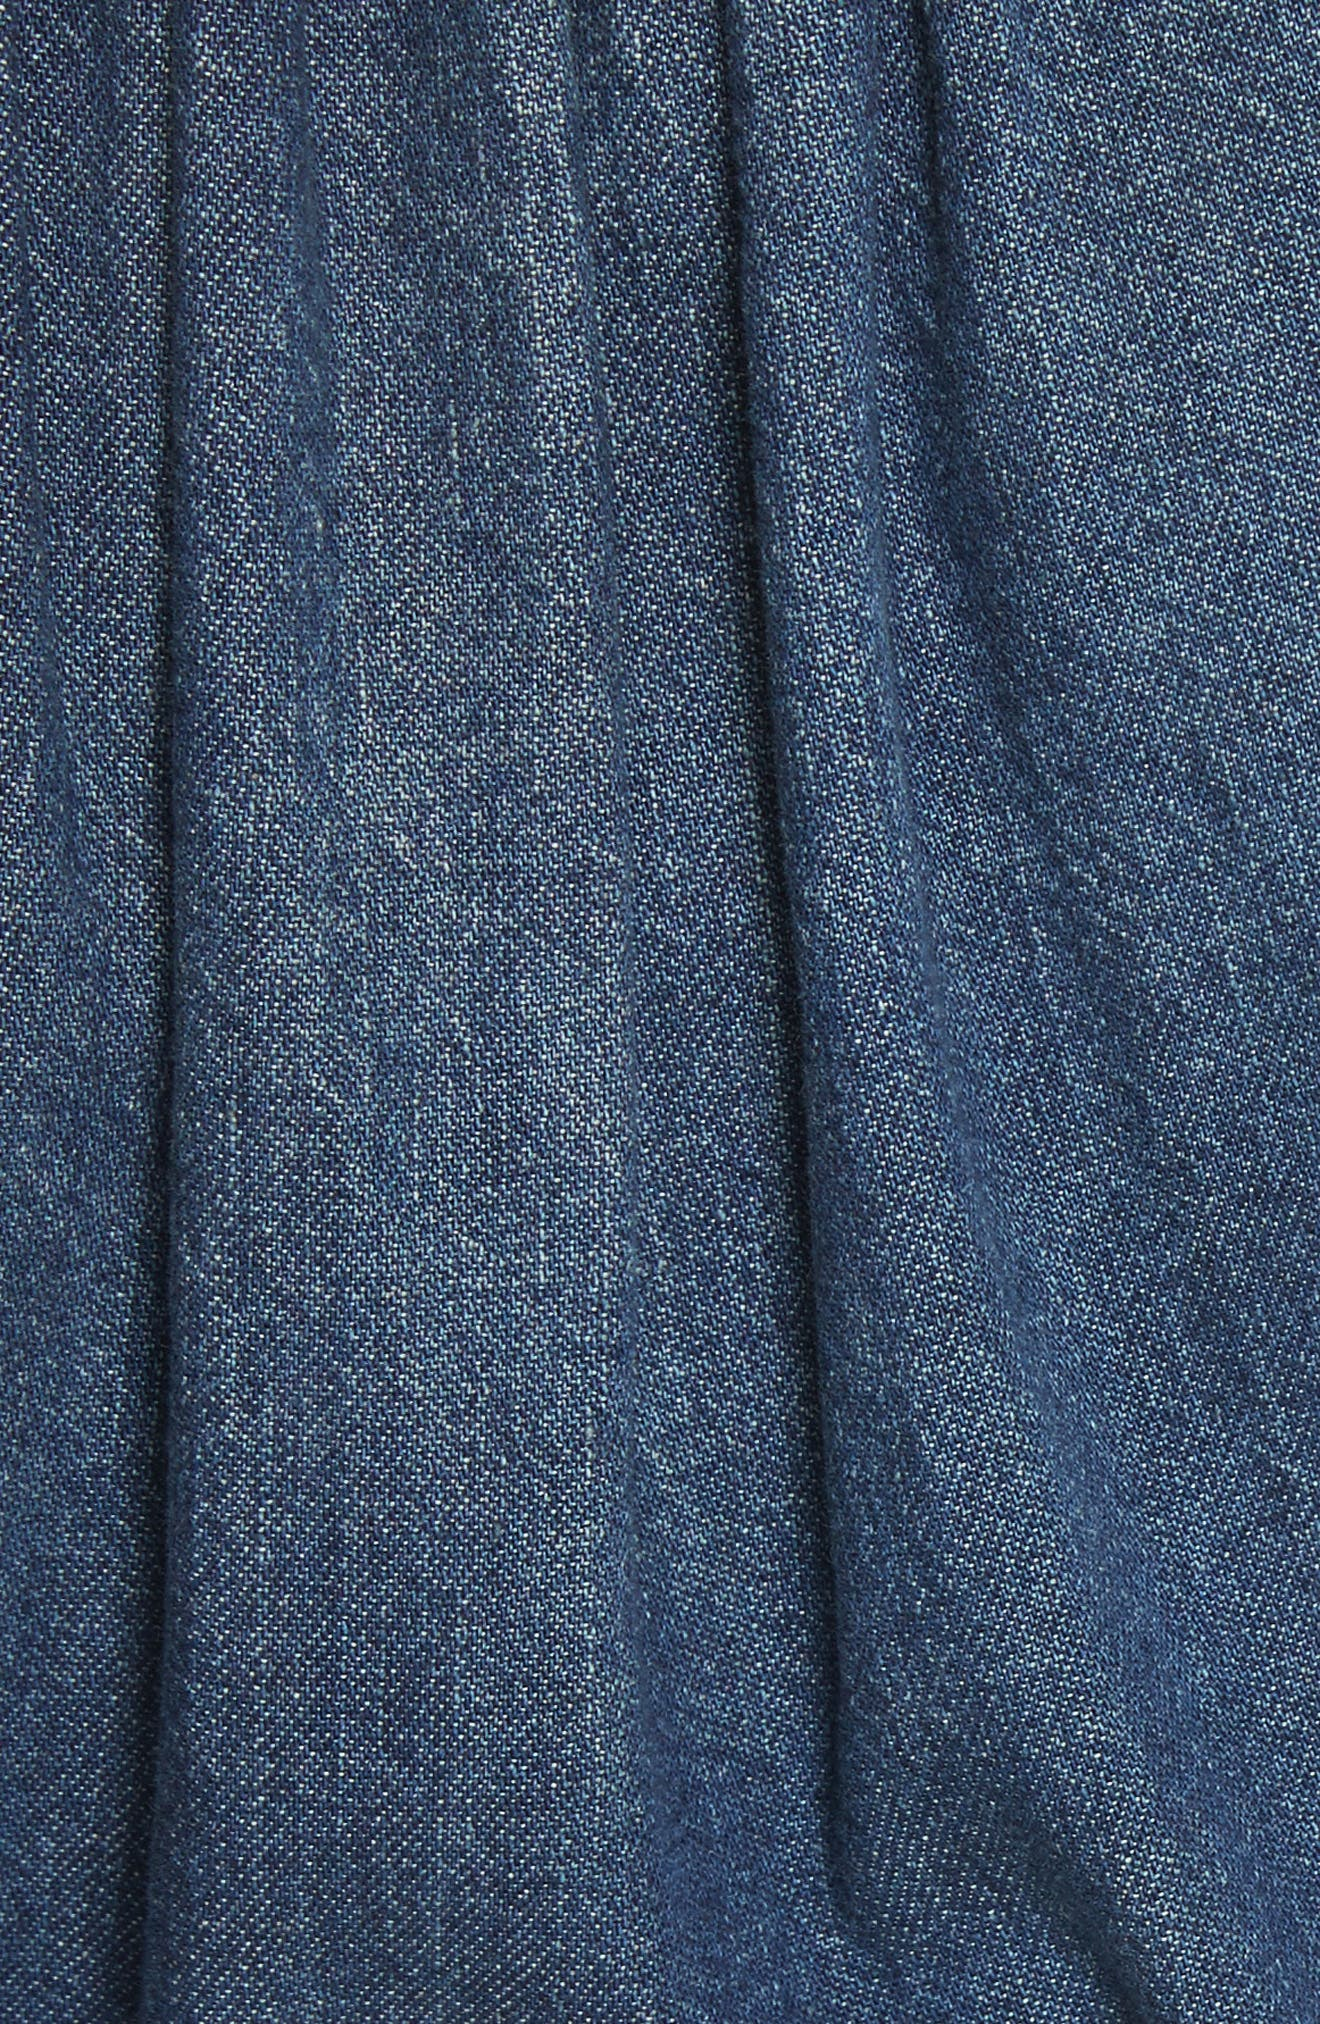 Denim Wrap Dress,                             Alternate thumbnail 5, color,                             Avignon Wash